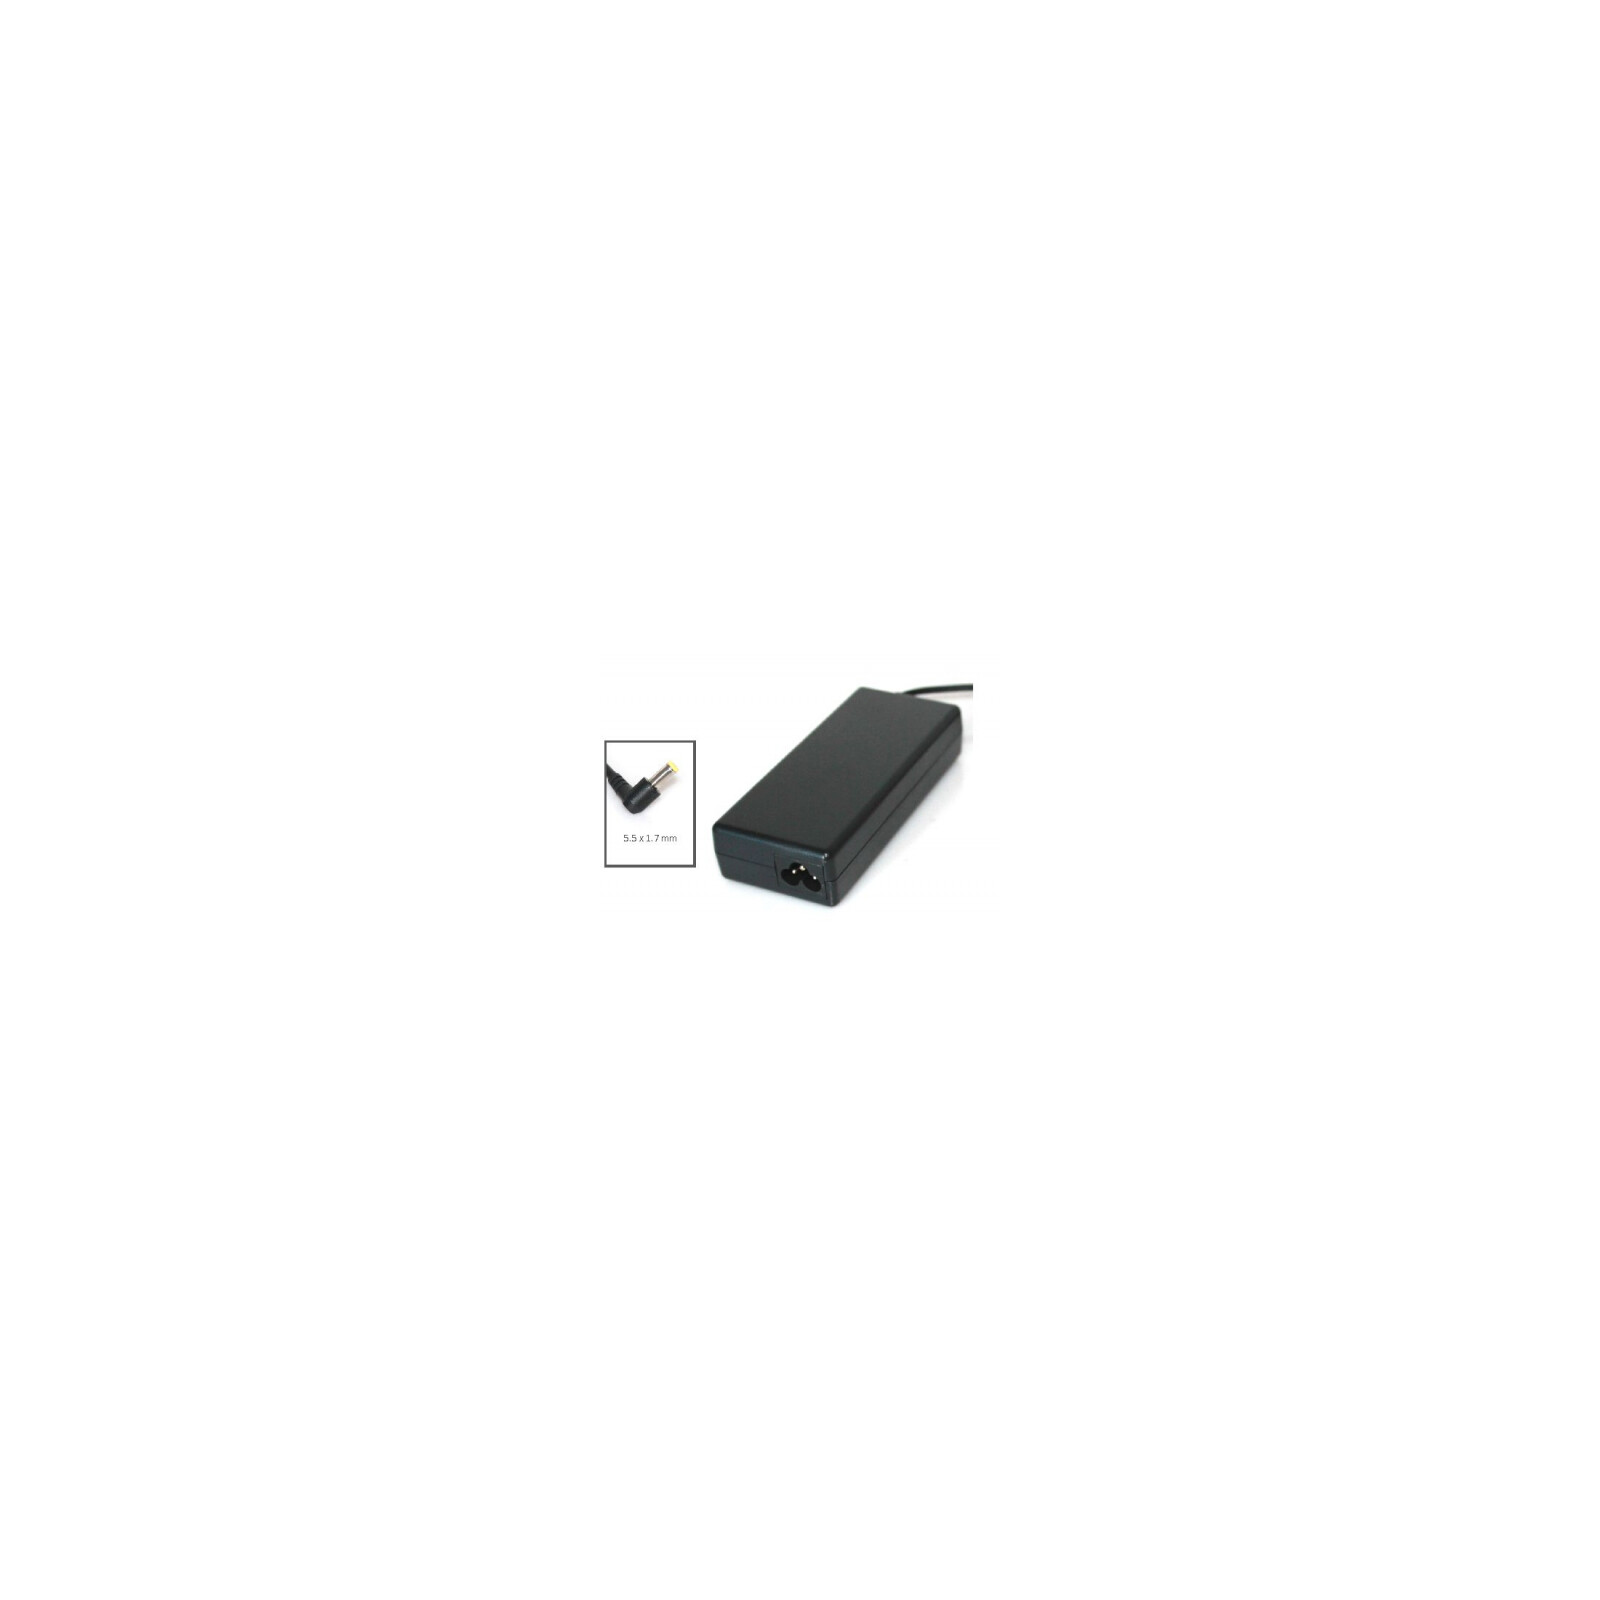 AGI Netzteil Acer Aspire 1650 90W